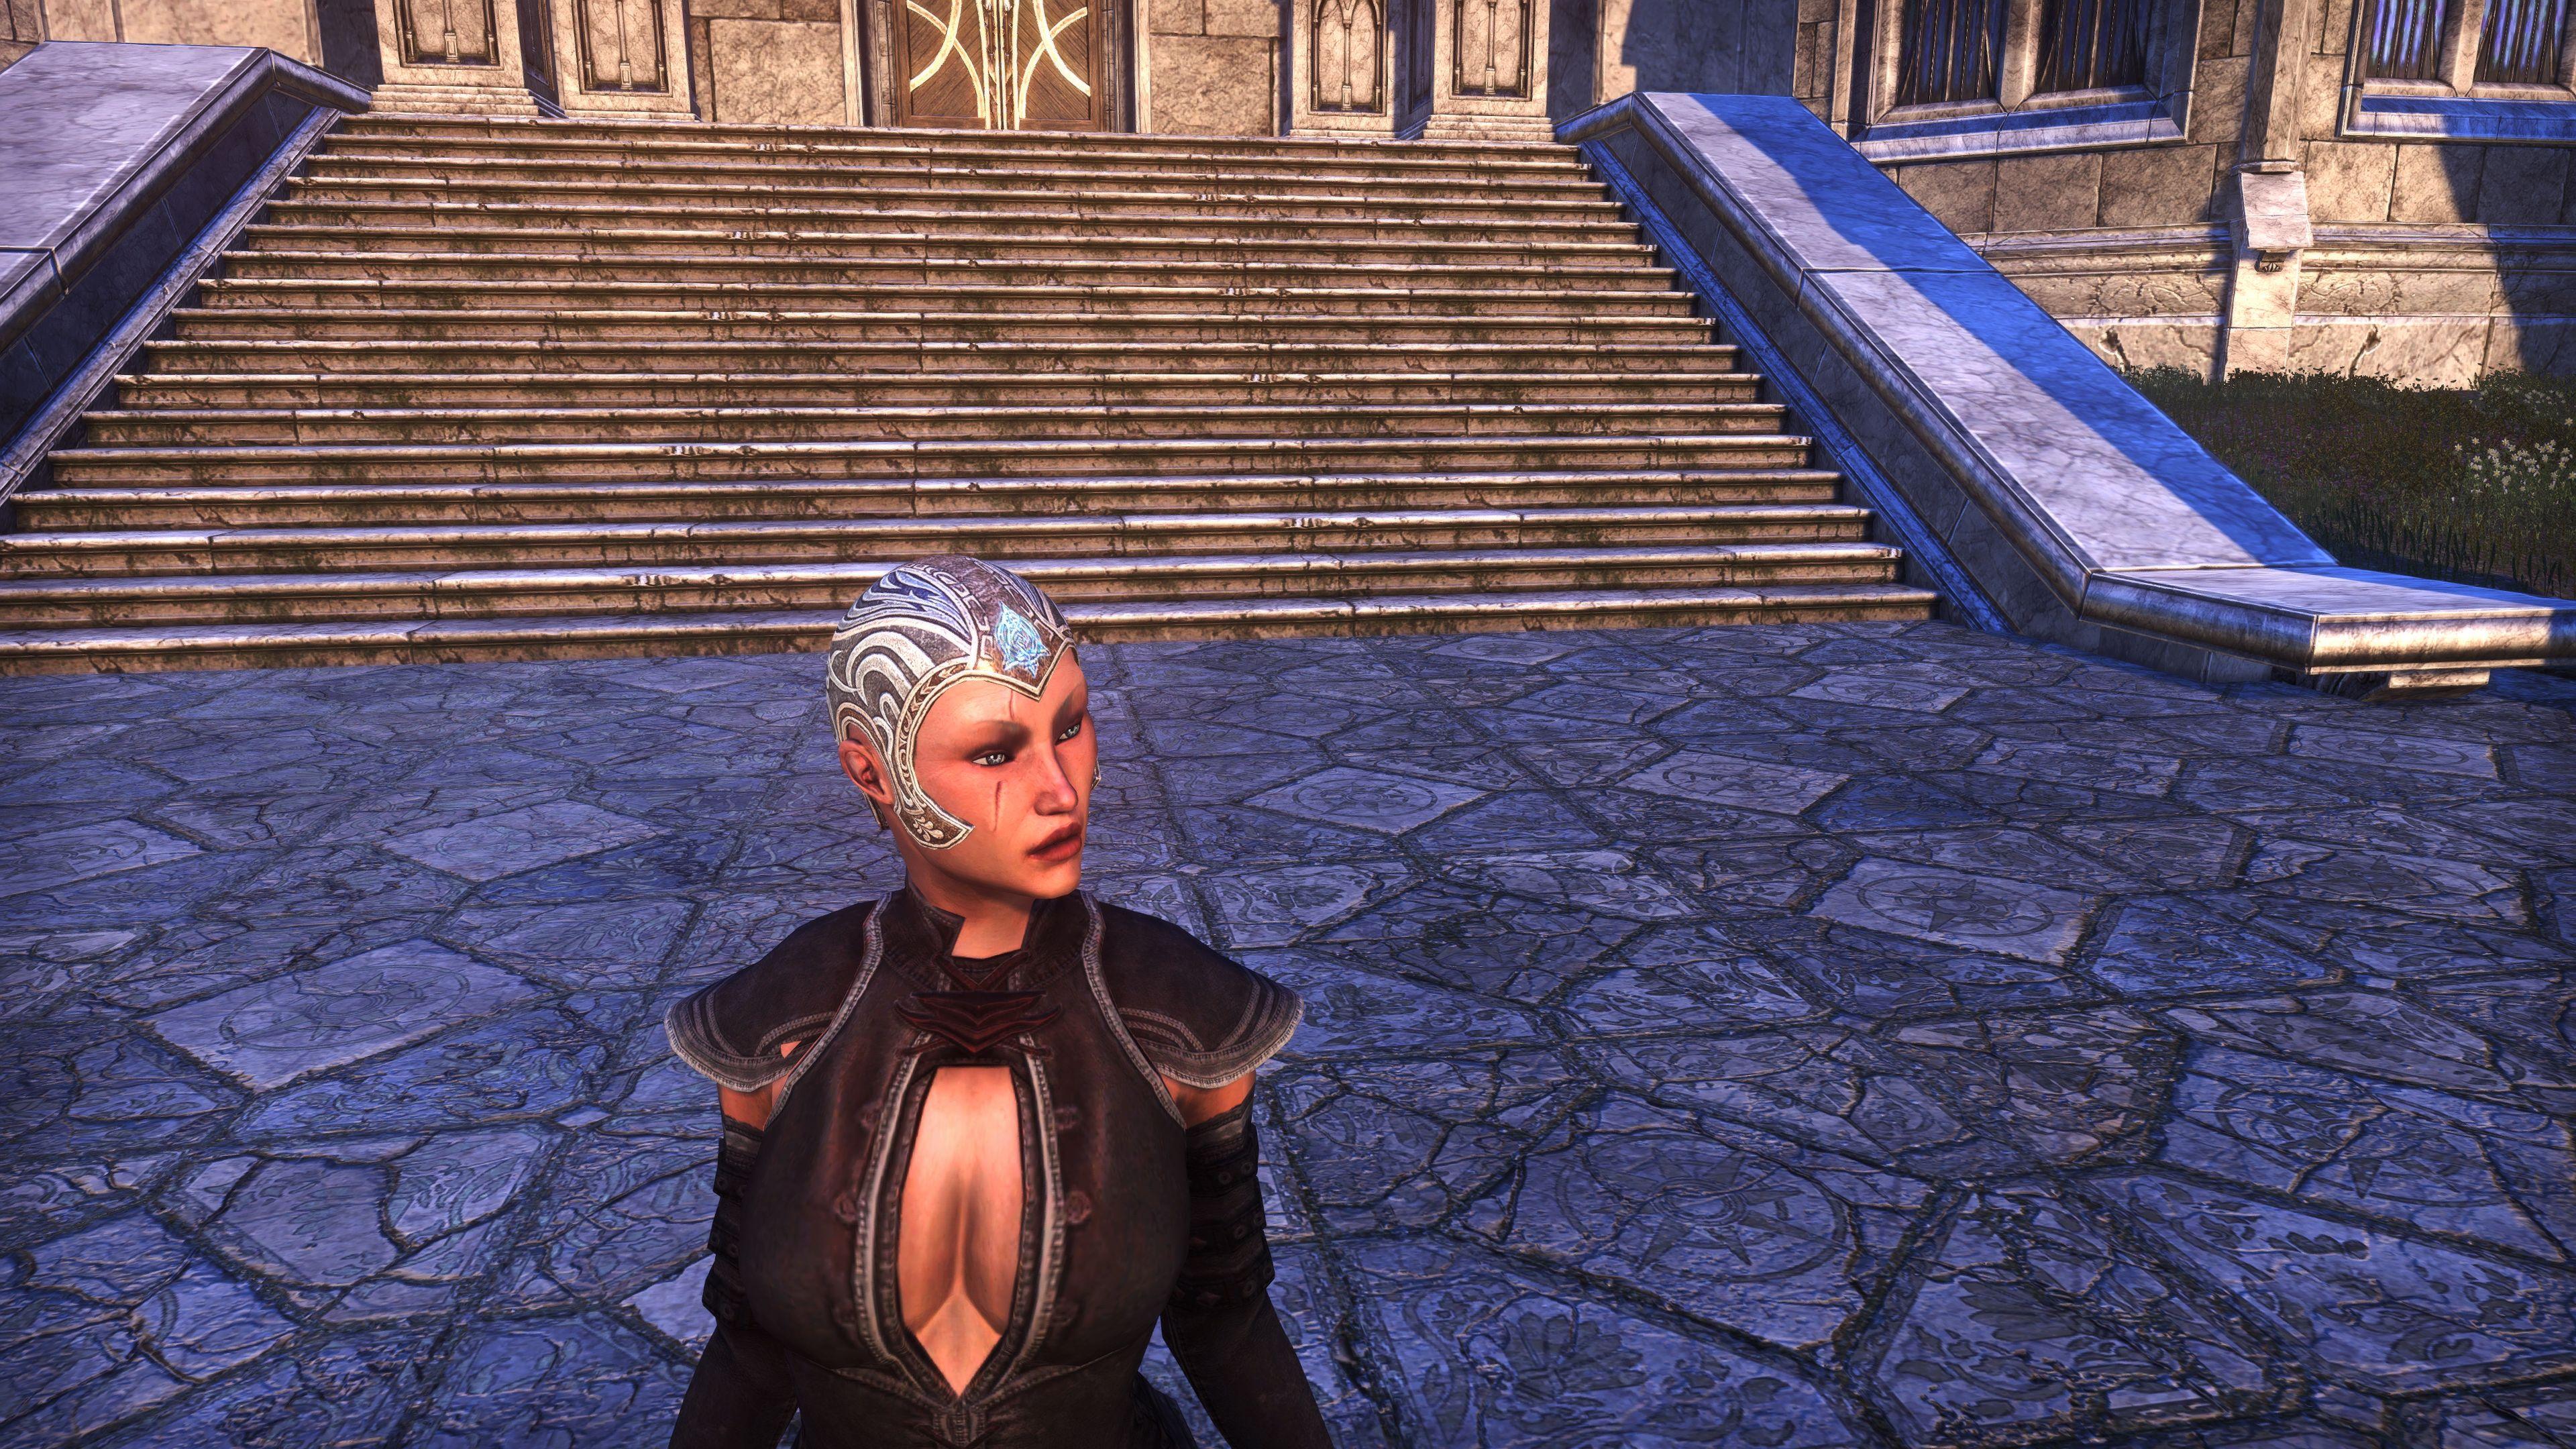 Sideburn Skullcap (Appearance > Hats), Psijic Vault Crate, The Elder Scrolls Online